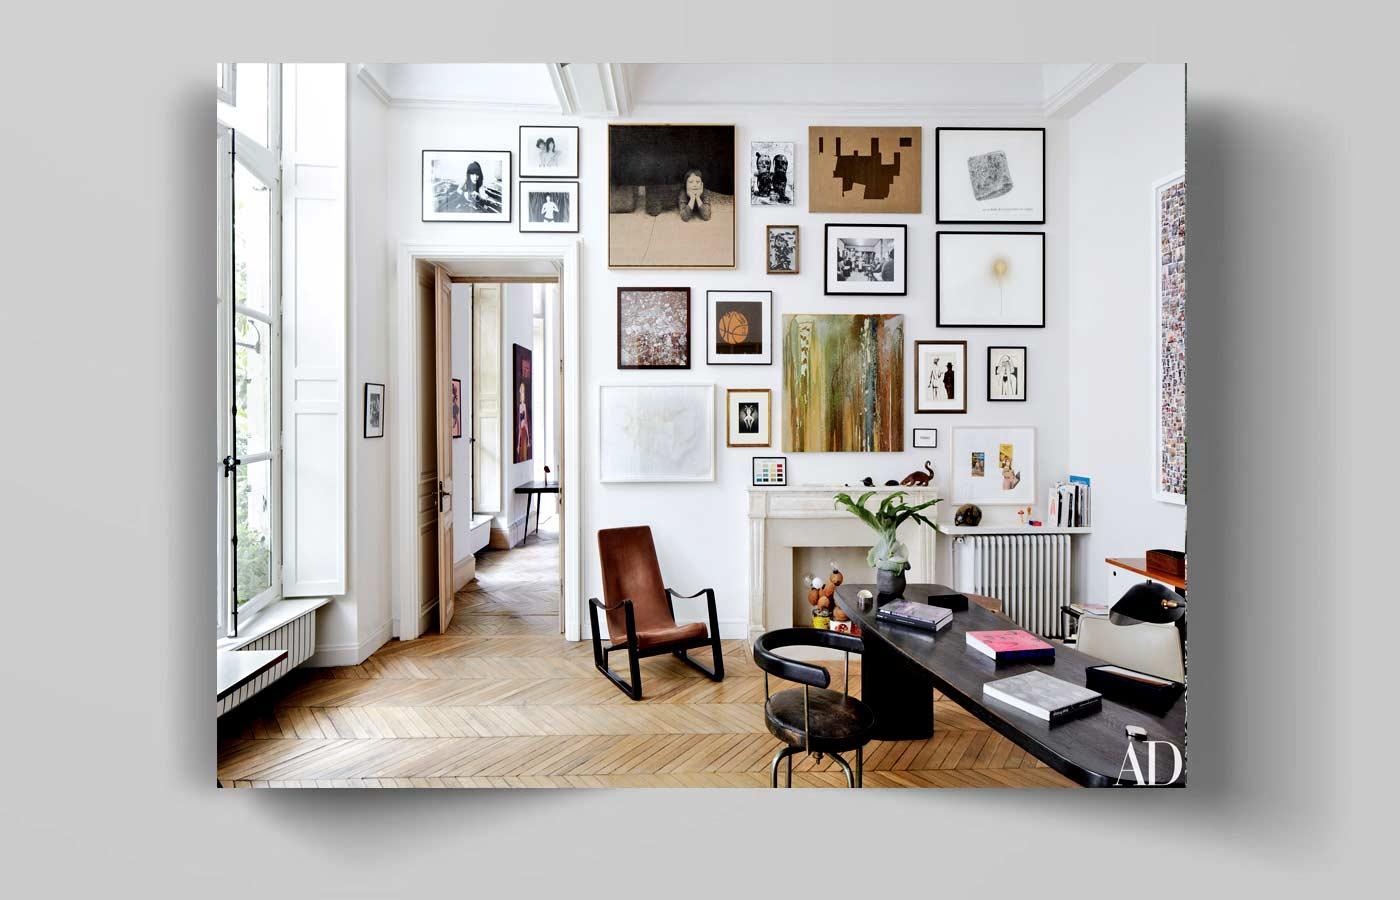 182rt - انواع آویز دیواری در دکوراسیون منزل